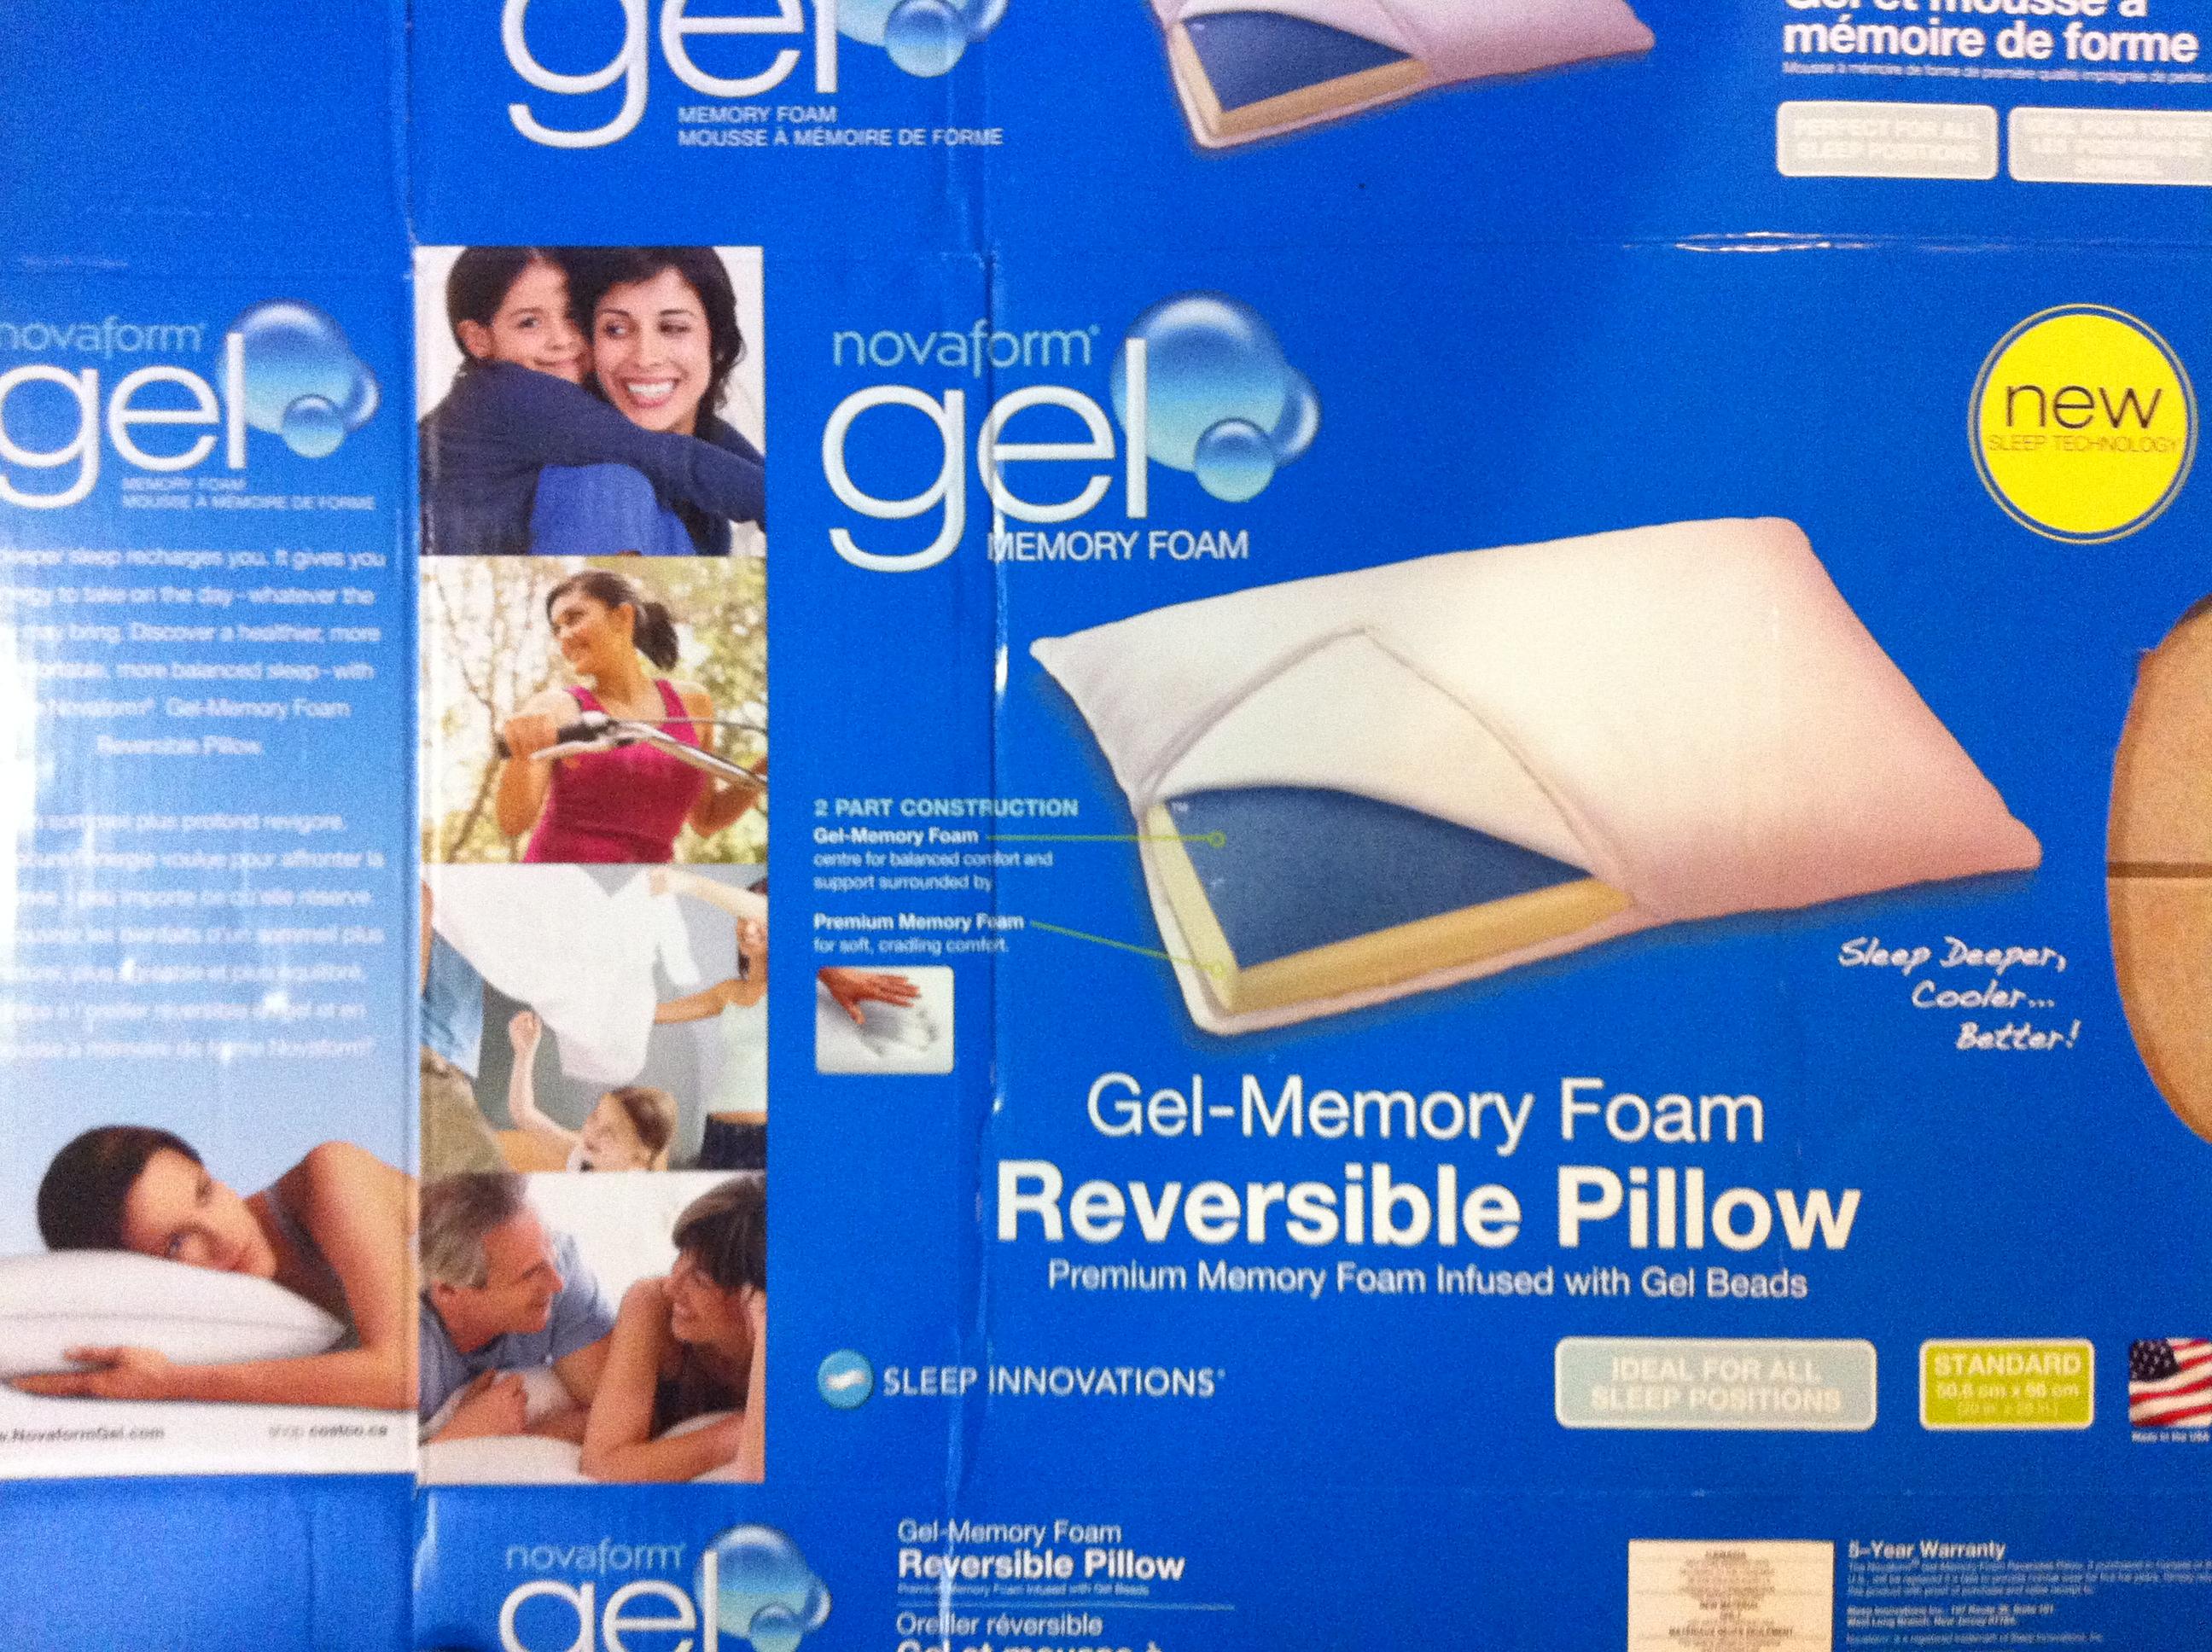 novaform gel memory foam pillow review